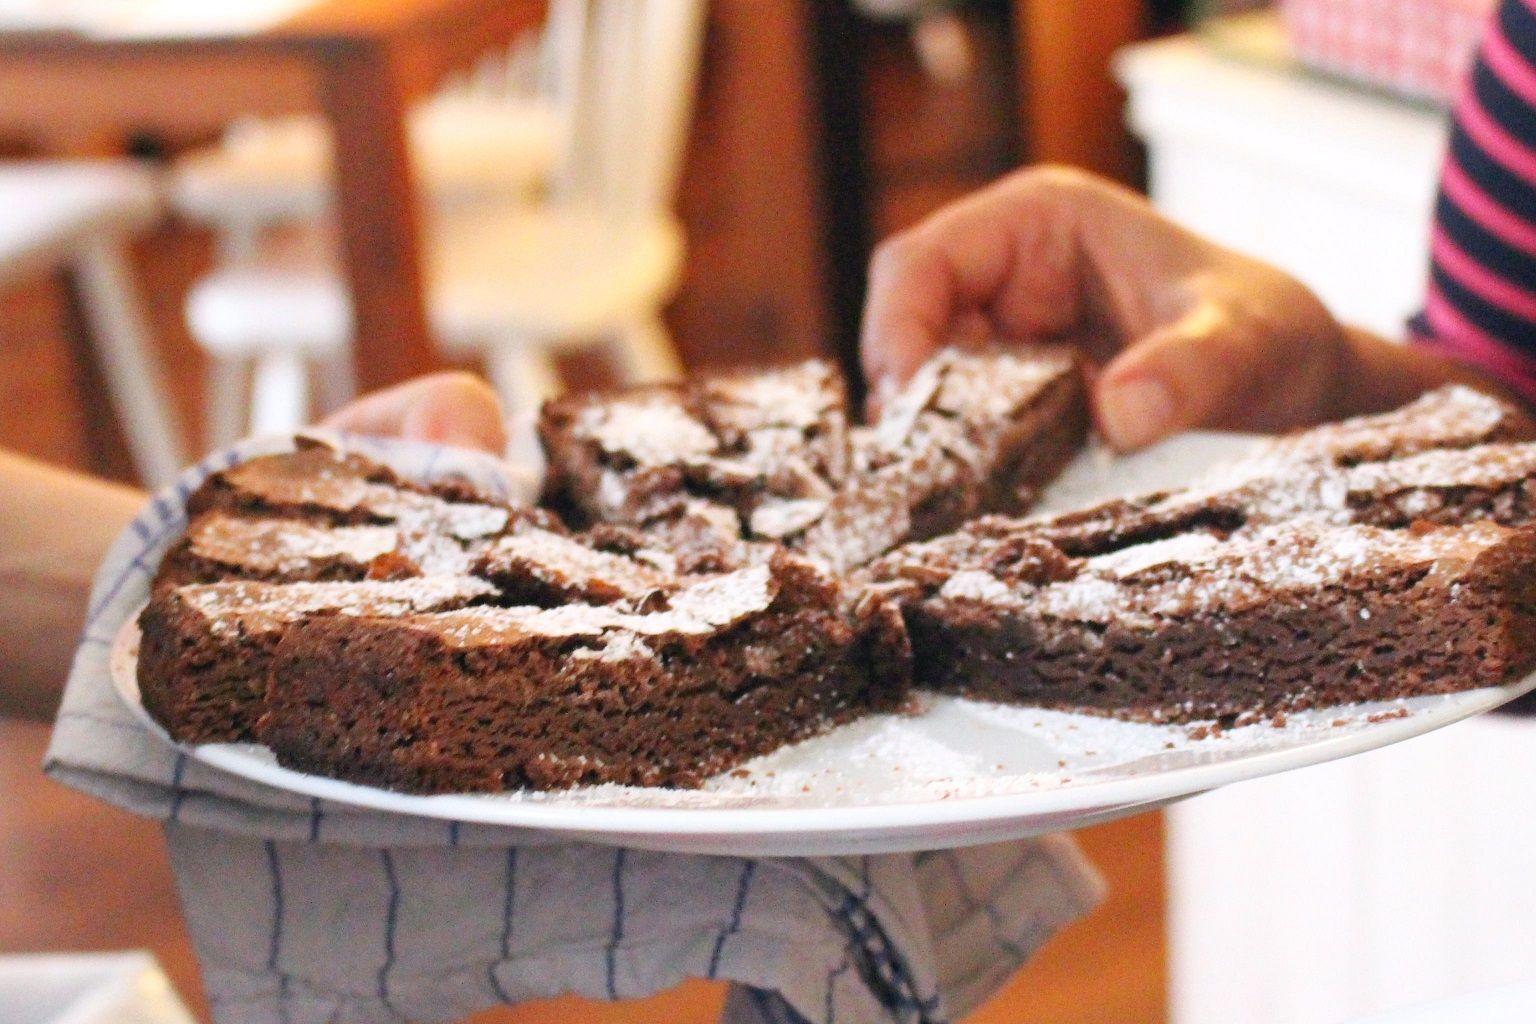 #Hamburg #Neustadt #Germany  #EatTheWorld #Culture #FoodTour | #Chocolate #Cake #Torte